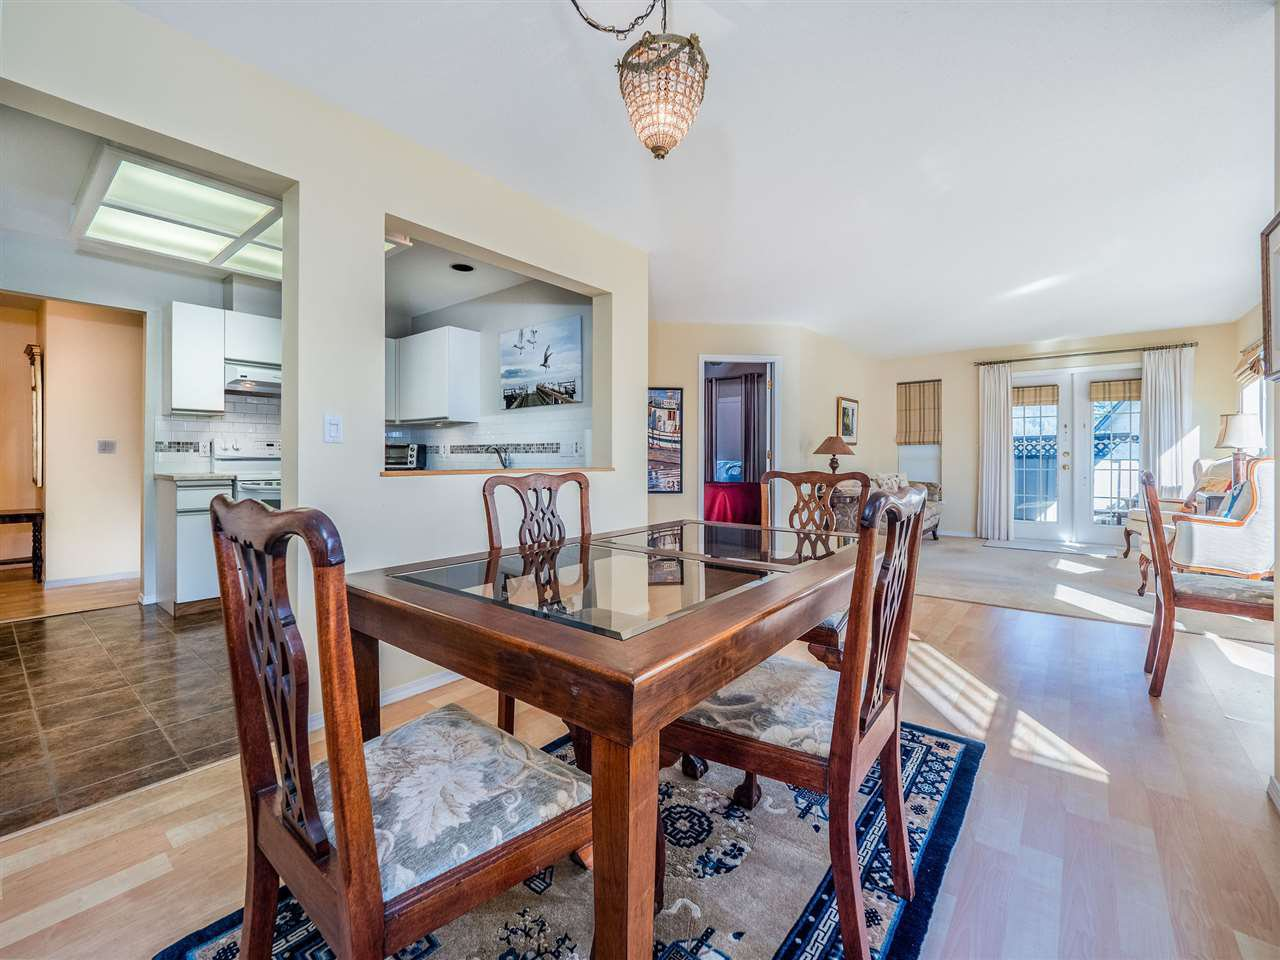 "Photo 10: Photos: 105 5768 MARINE Way in Sechelt: Sechelt District Condo for sale in ""Cypress Ridge"" (Sunshine Coast)  : MLS®# R2446337"